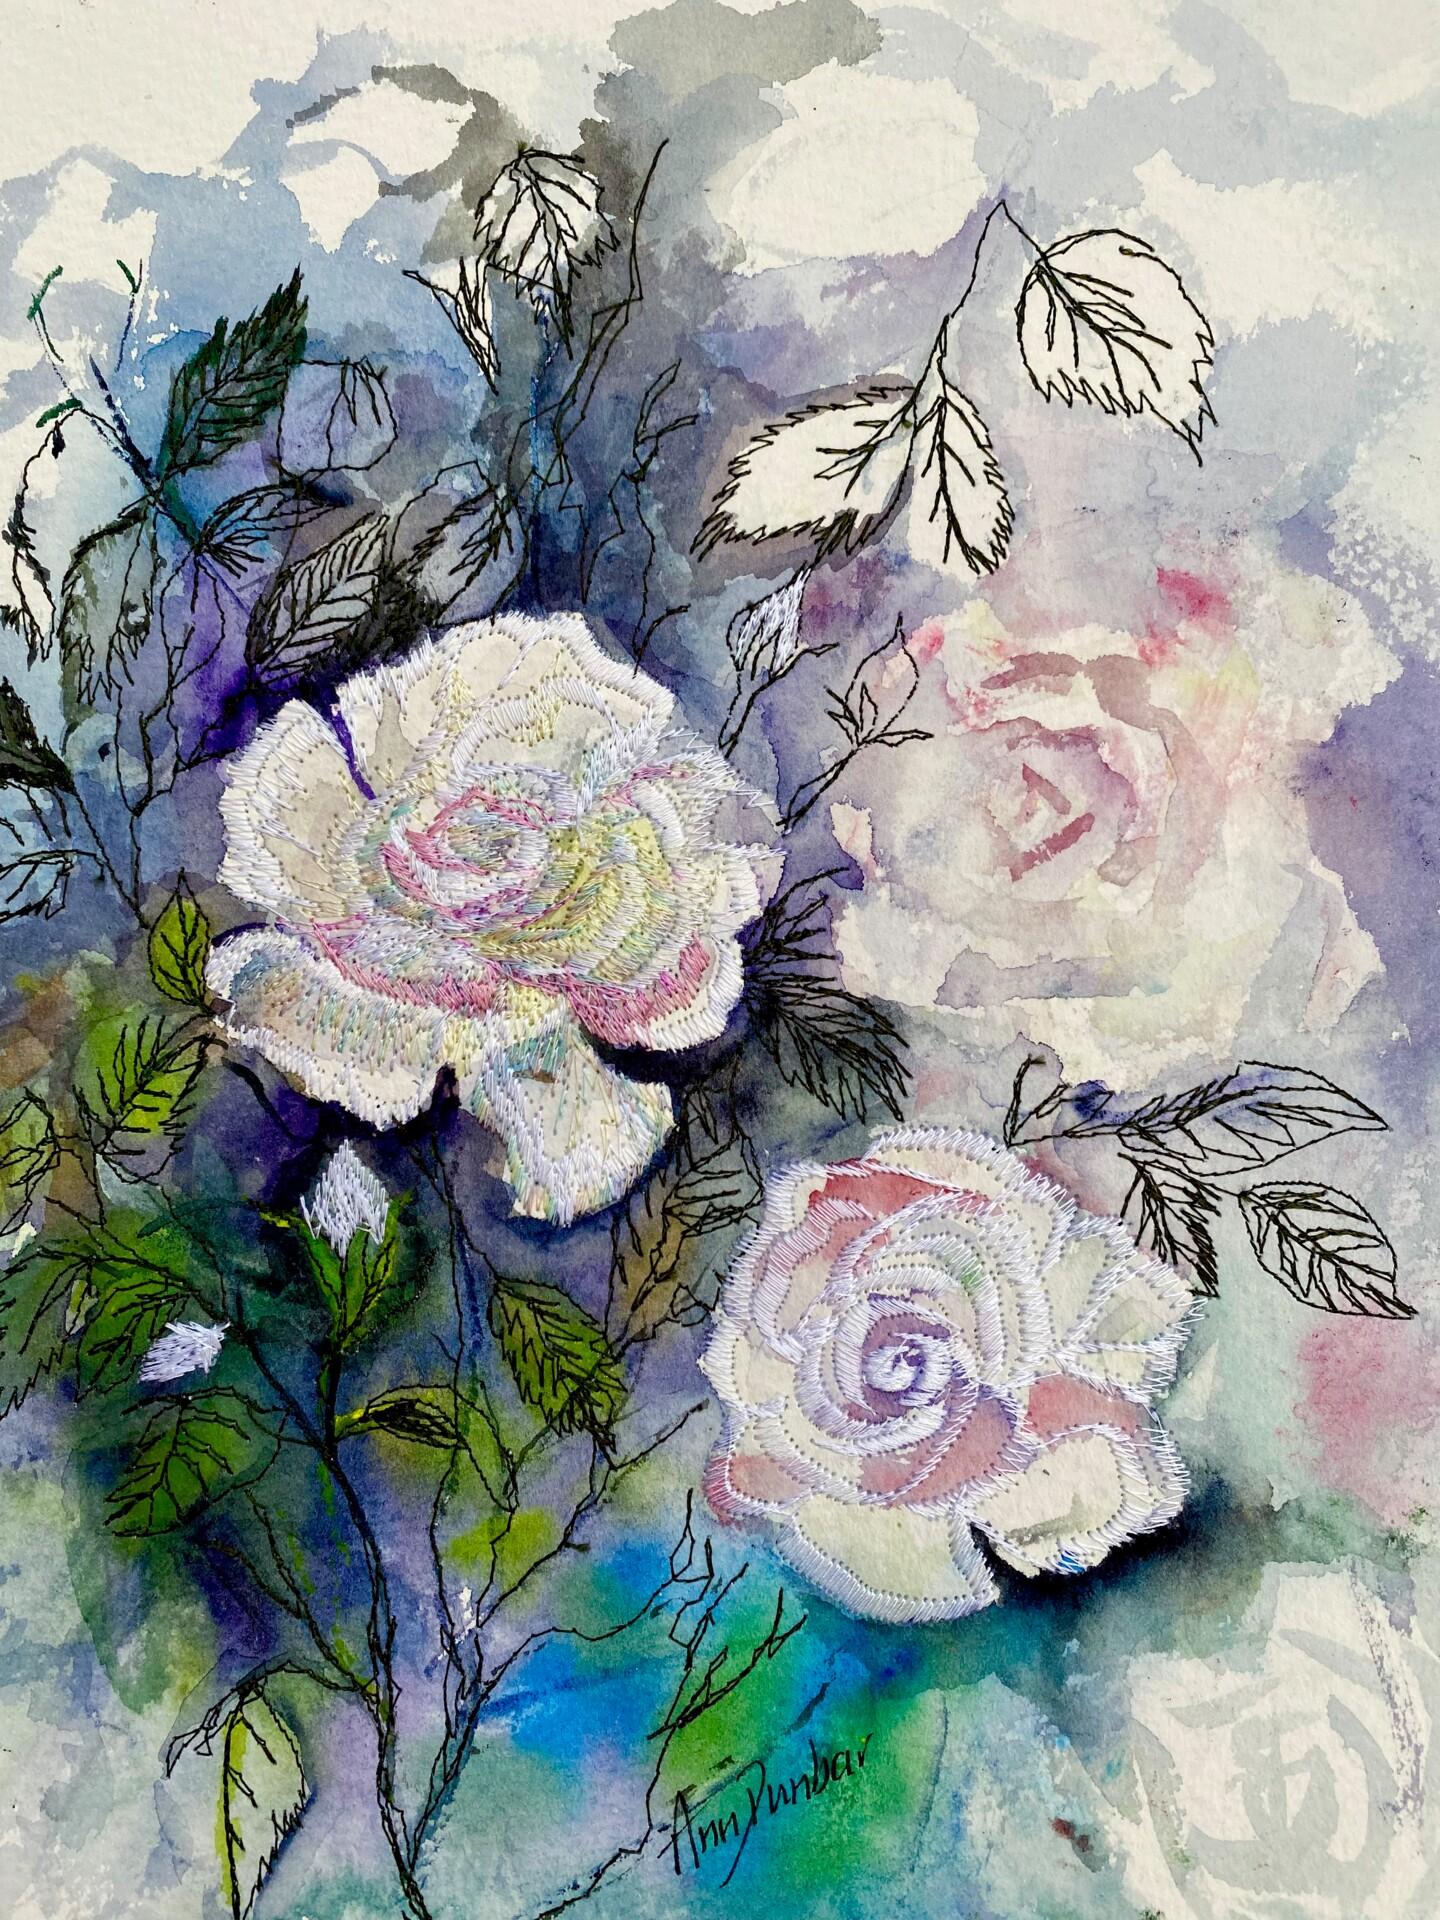 Ann Dunbar - Roses in hues of white